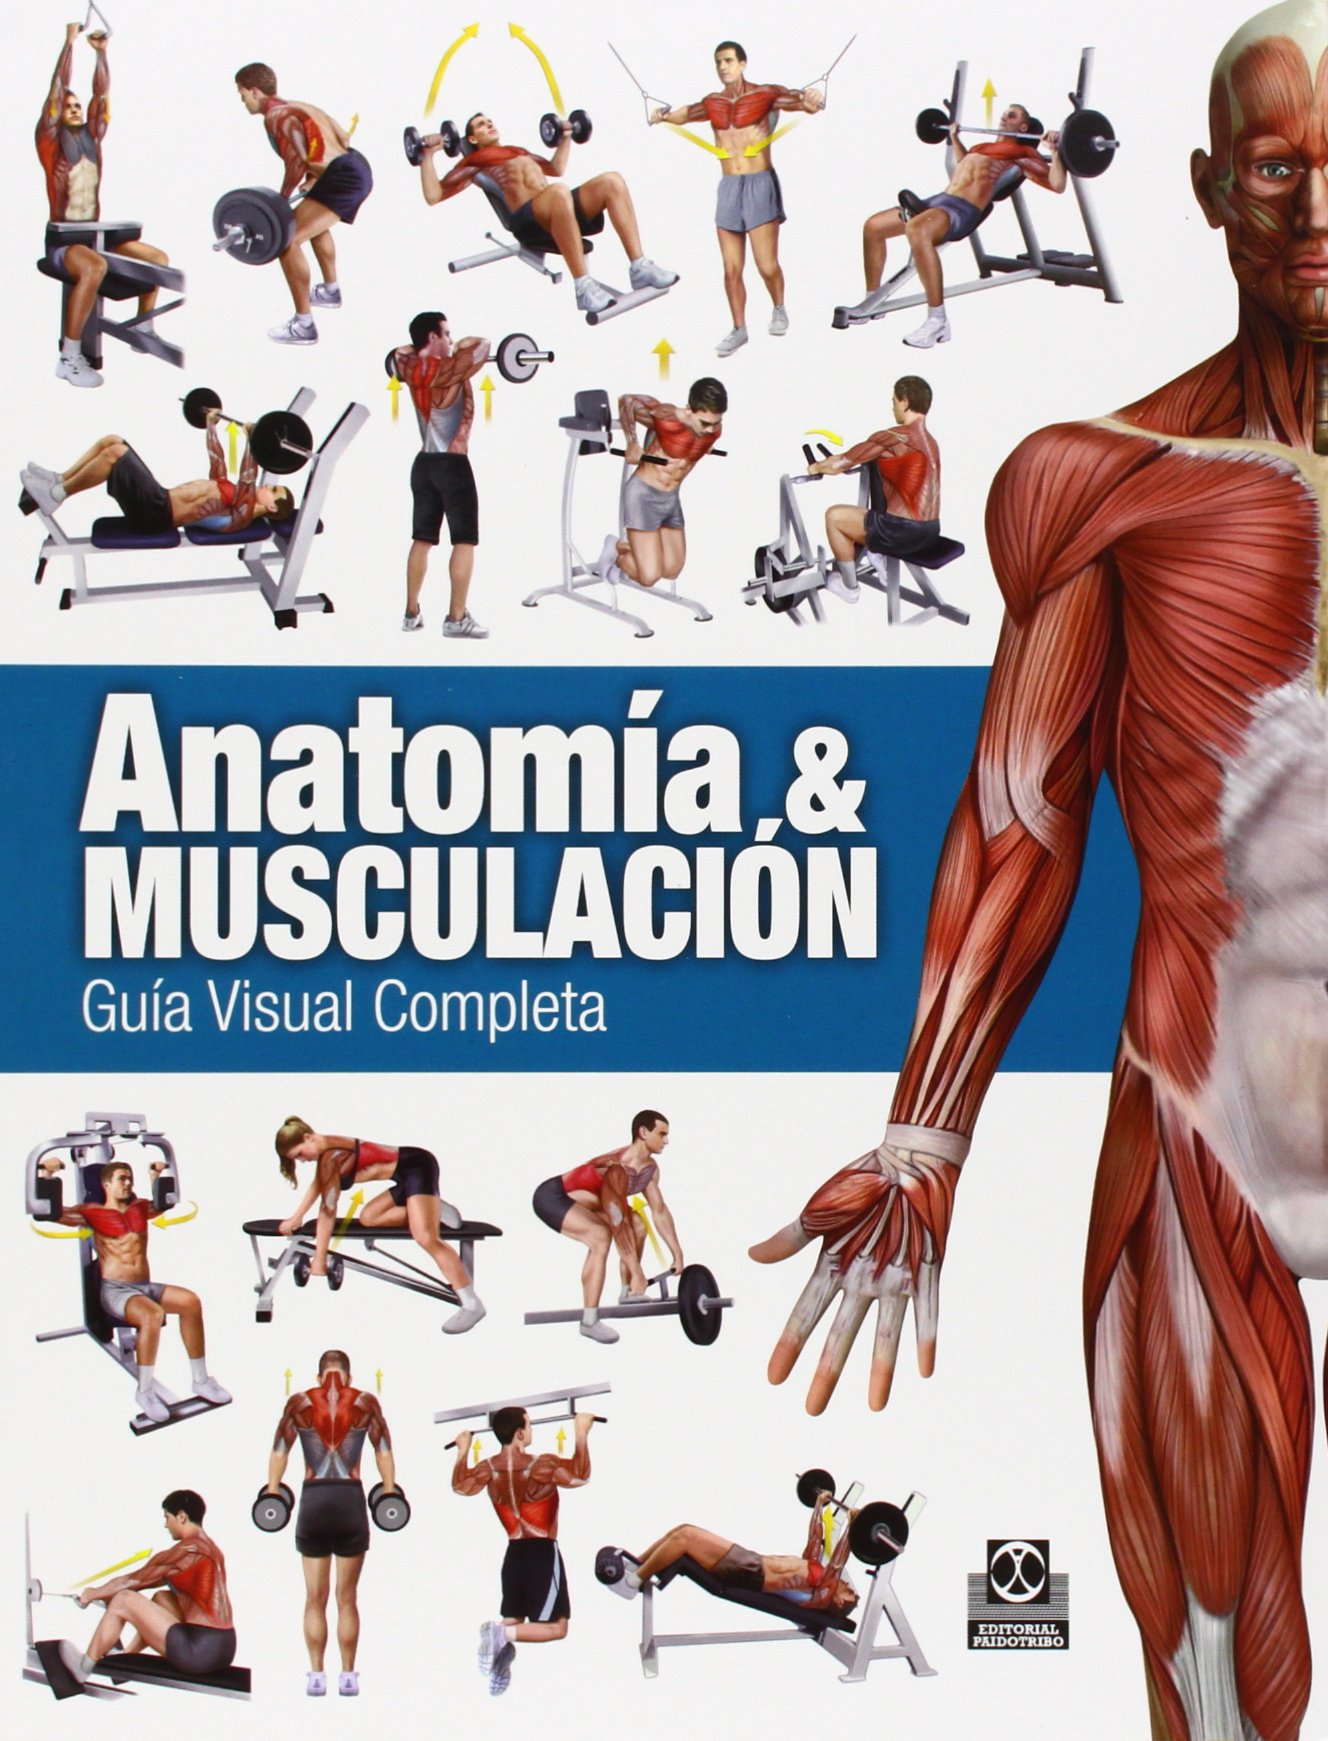 Anatomia y musculacion. Guia visual completa (Spanish Edition) (Spanish) Paperback – October 9, 2014